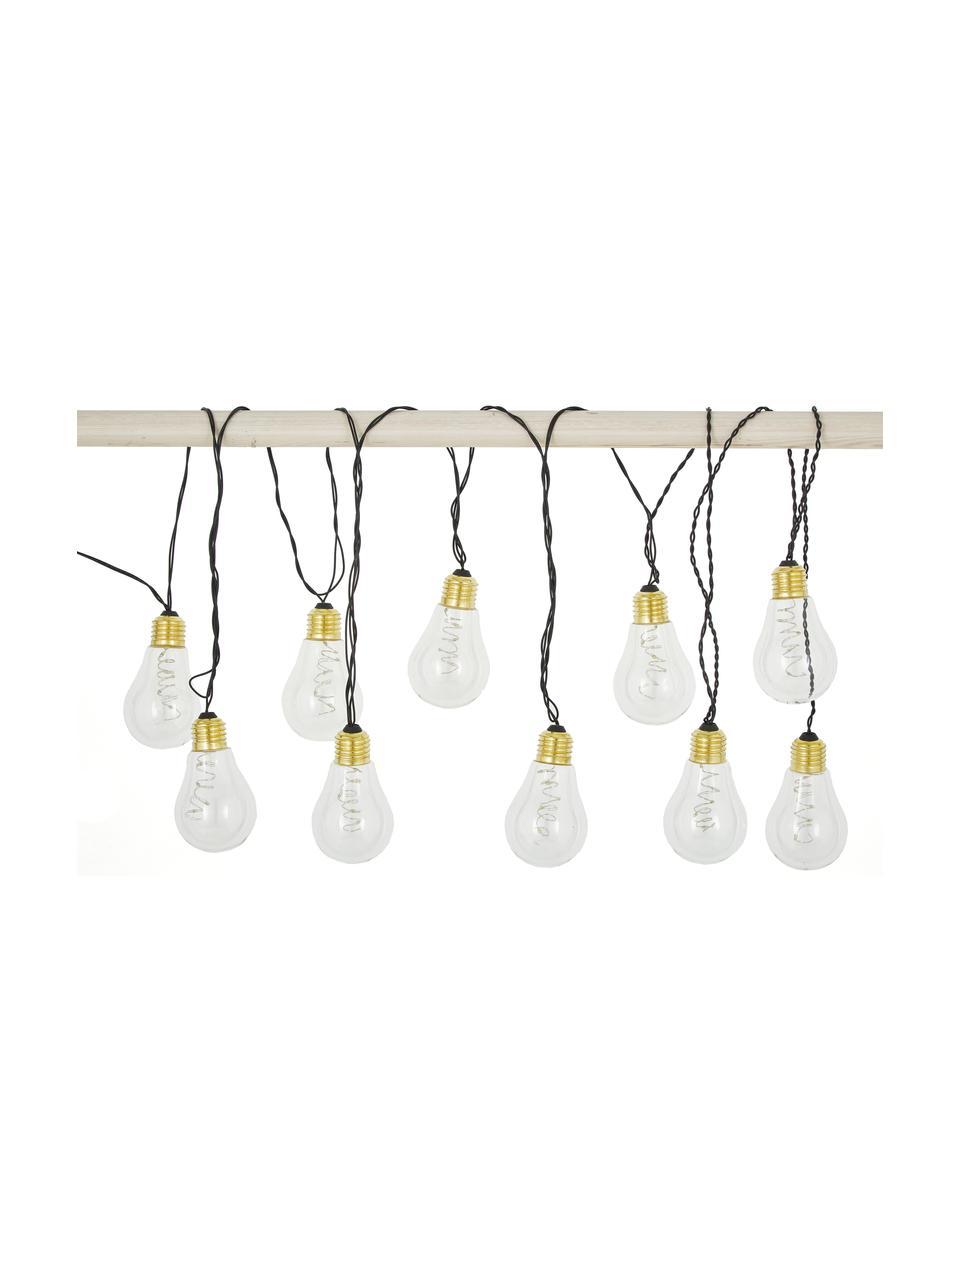 Ghirlanda  a LED Bulb, 360 cm, Lampadina: materiale sintetico, meta, Lampadina: trasparente, dorato, Cavo: nero, Lung. 360 cm